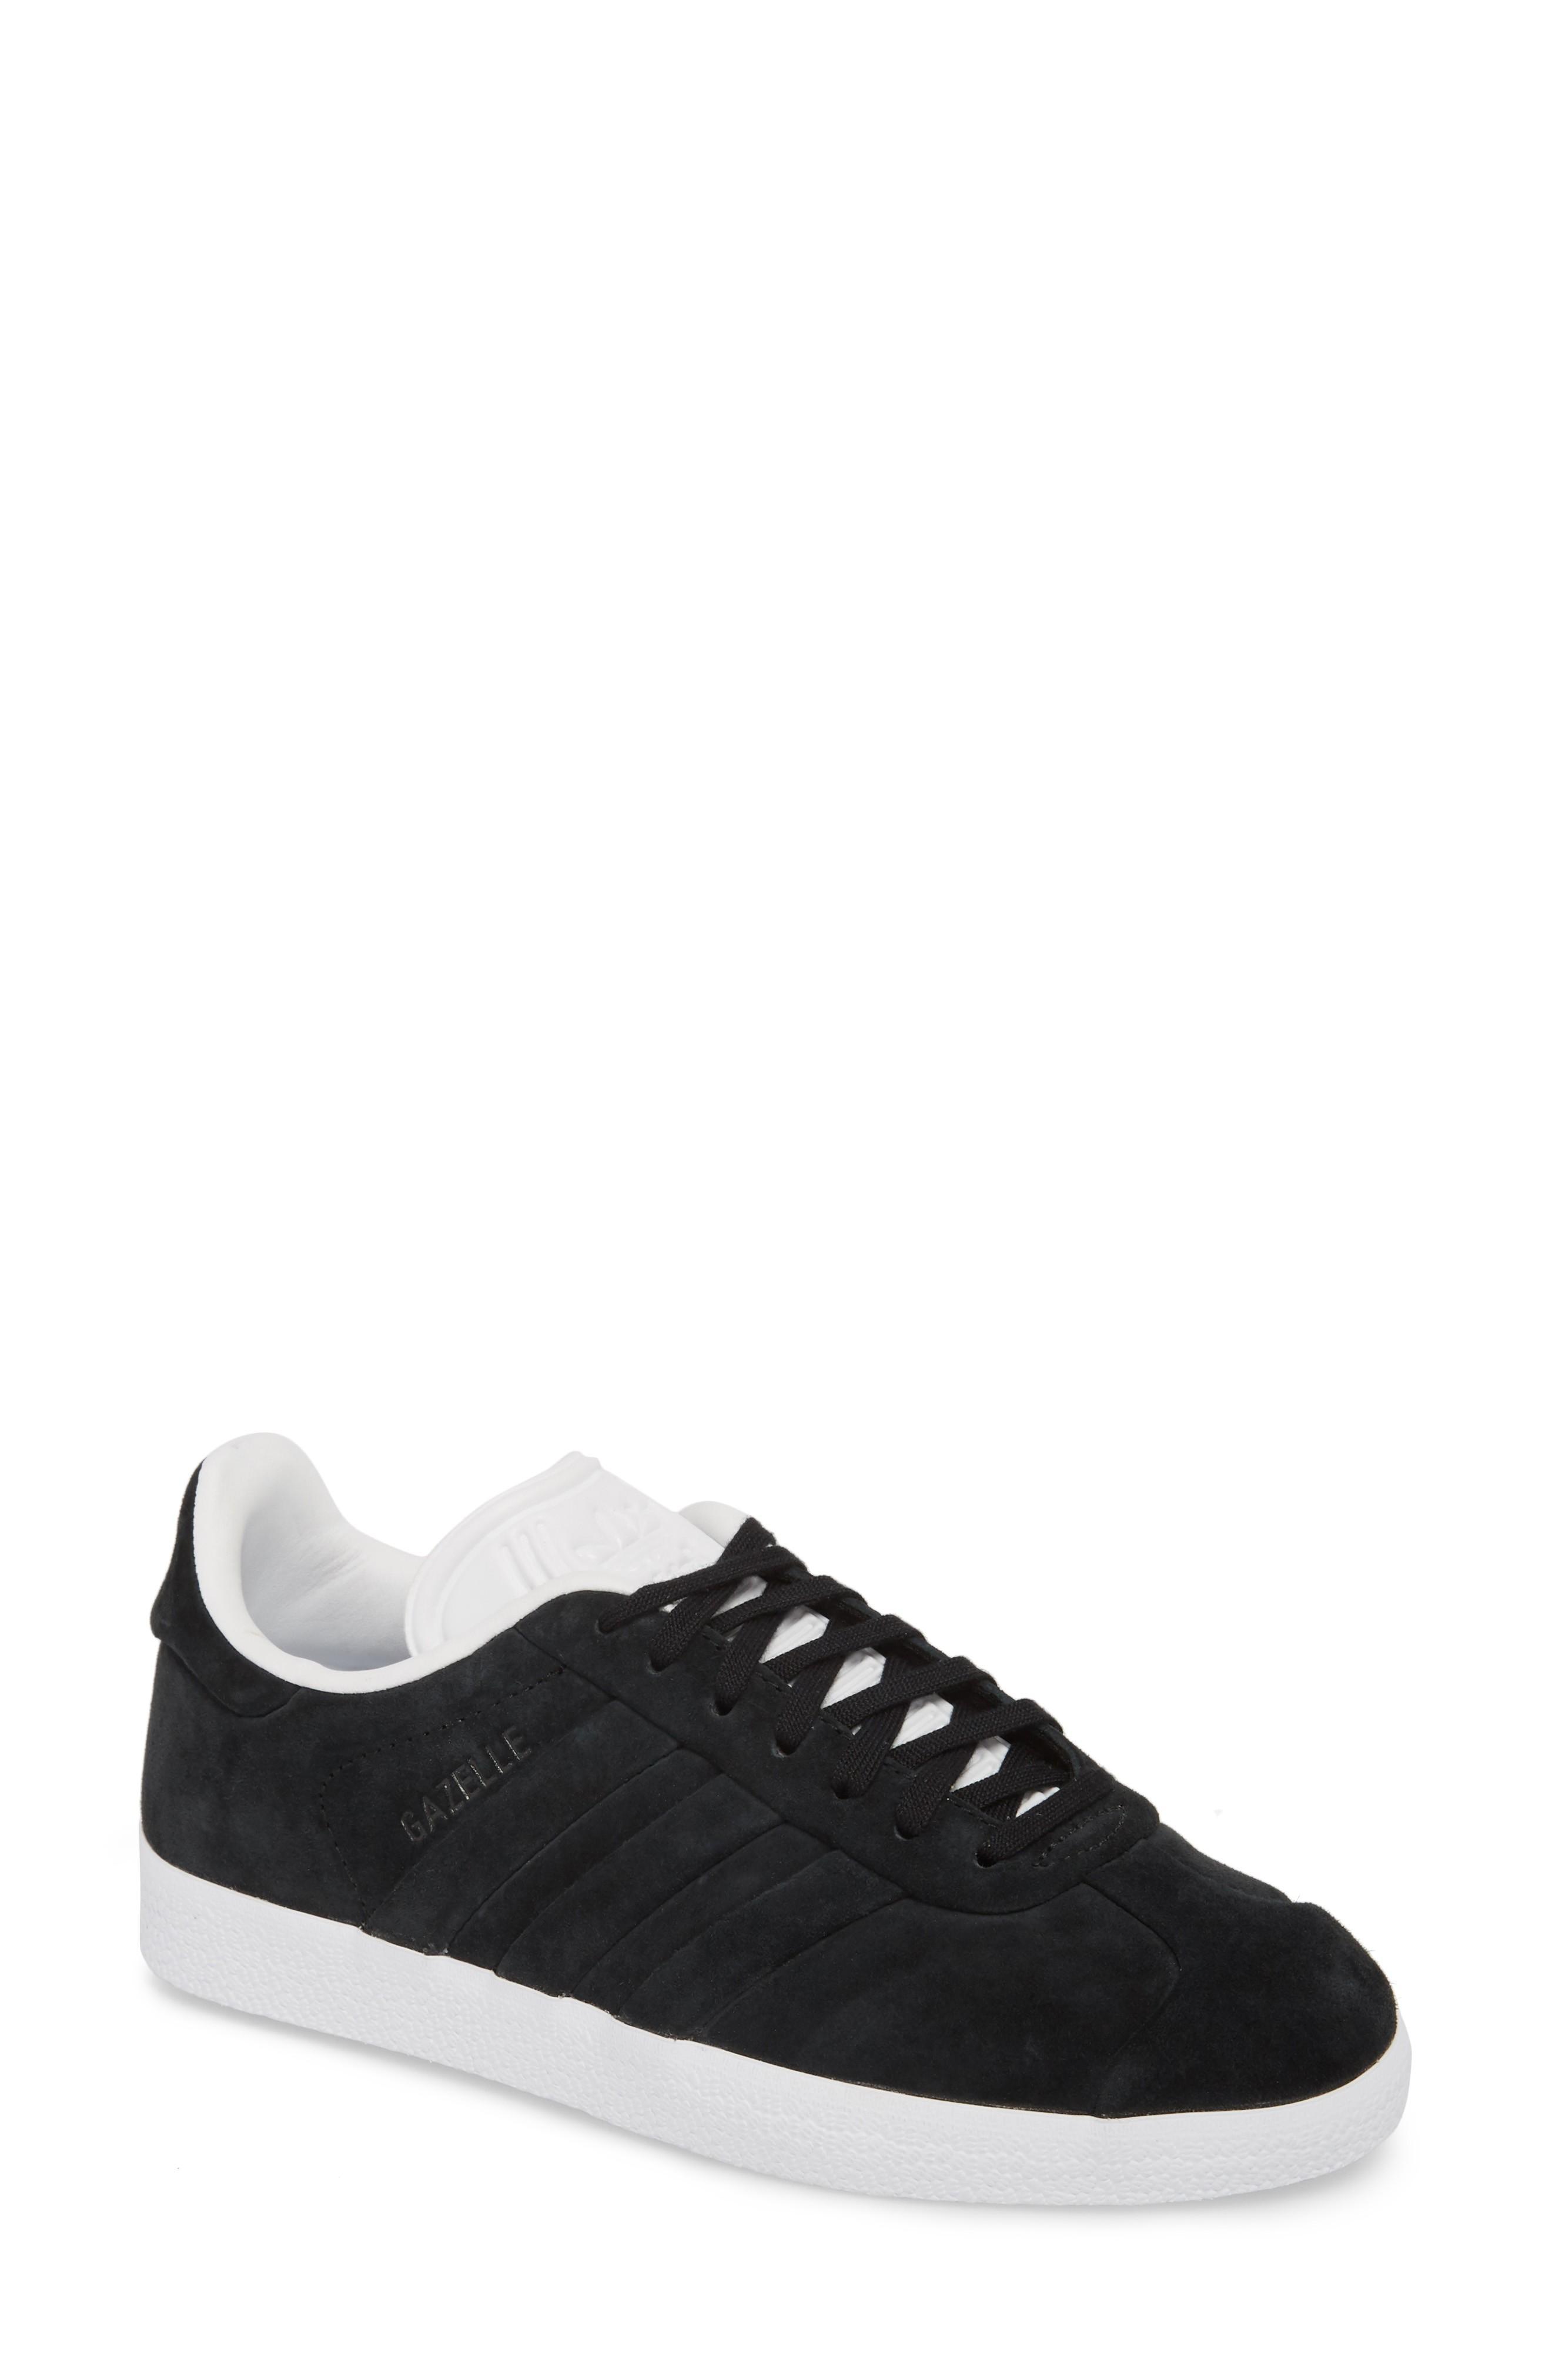 ADIDAS ORIGINALS. Gazelle Stitch   Turn Sneaker in Core Black  Core Black   White 1234af278